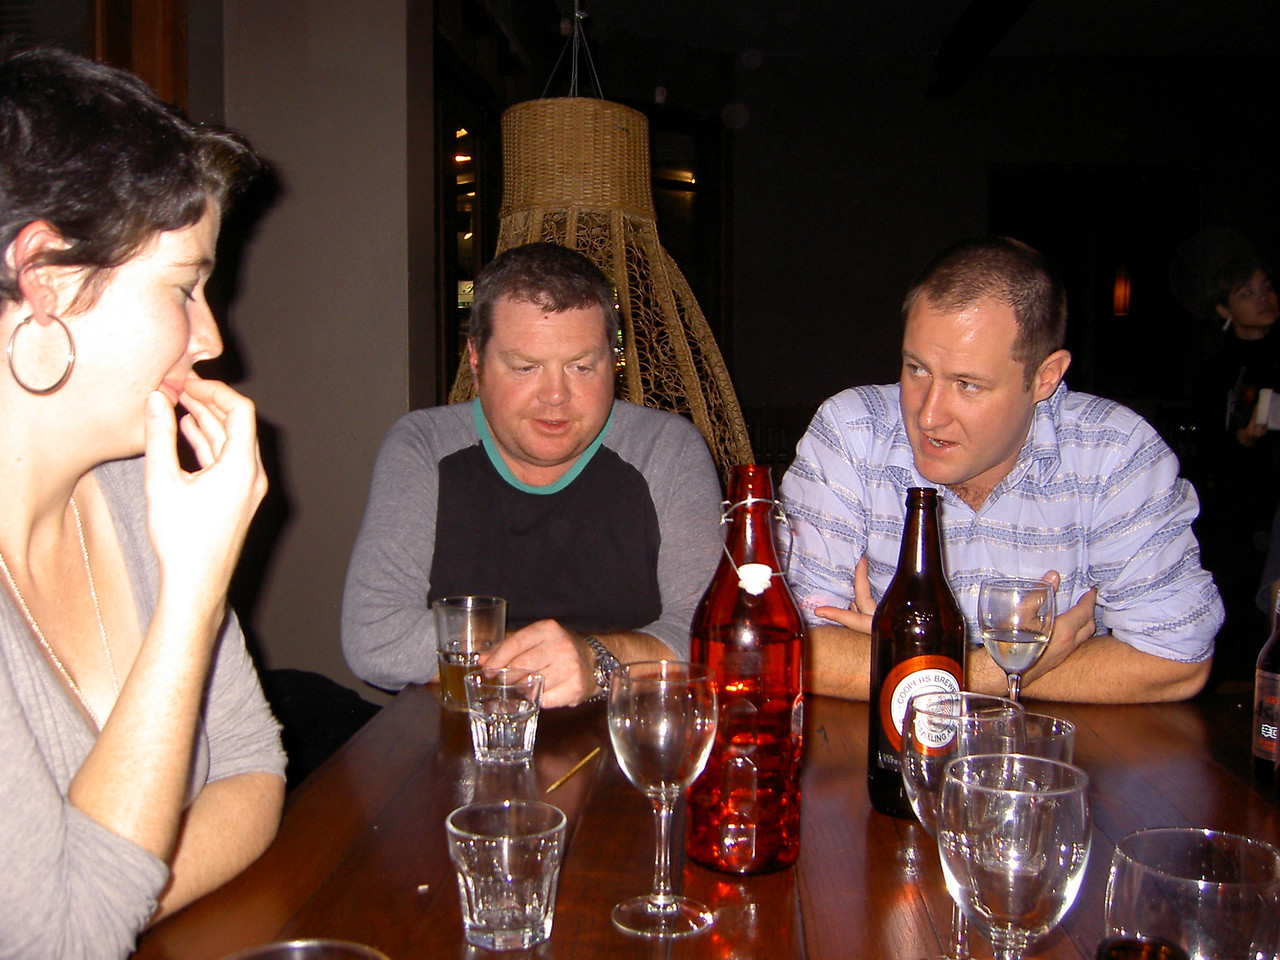 Maz, Scott, Don @Thairiffic